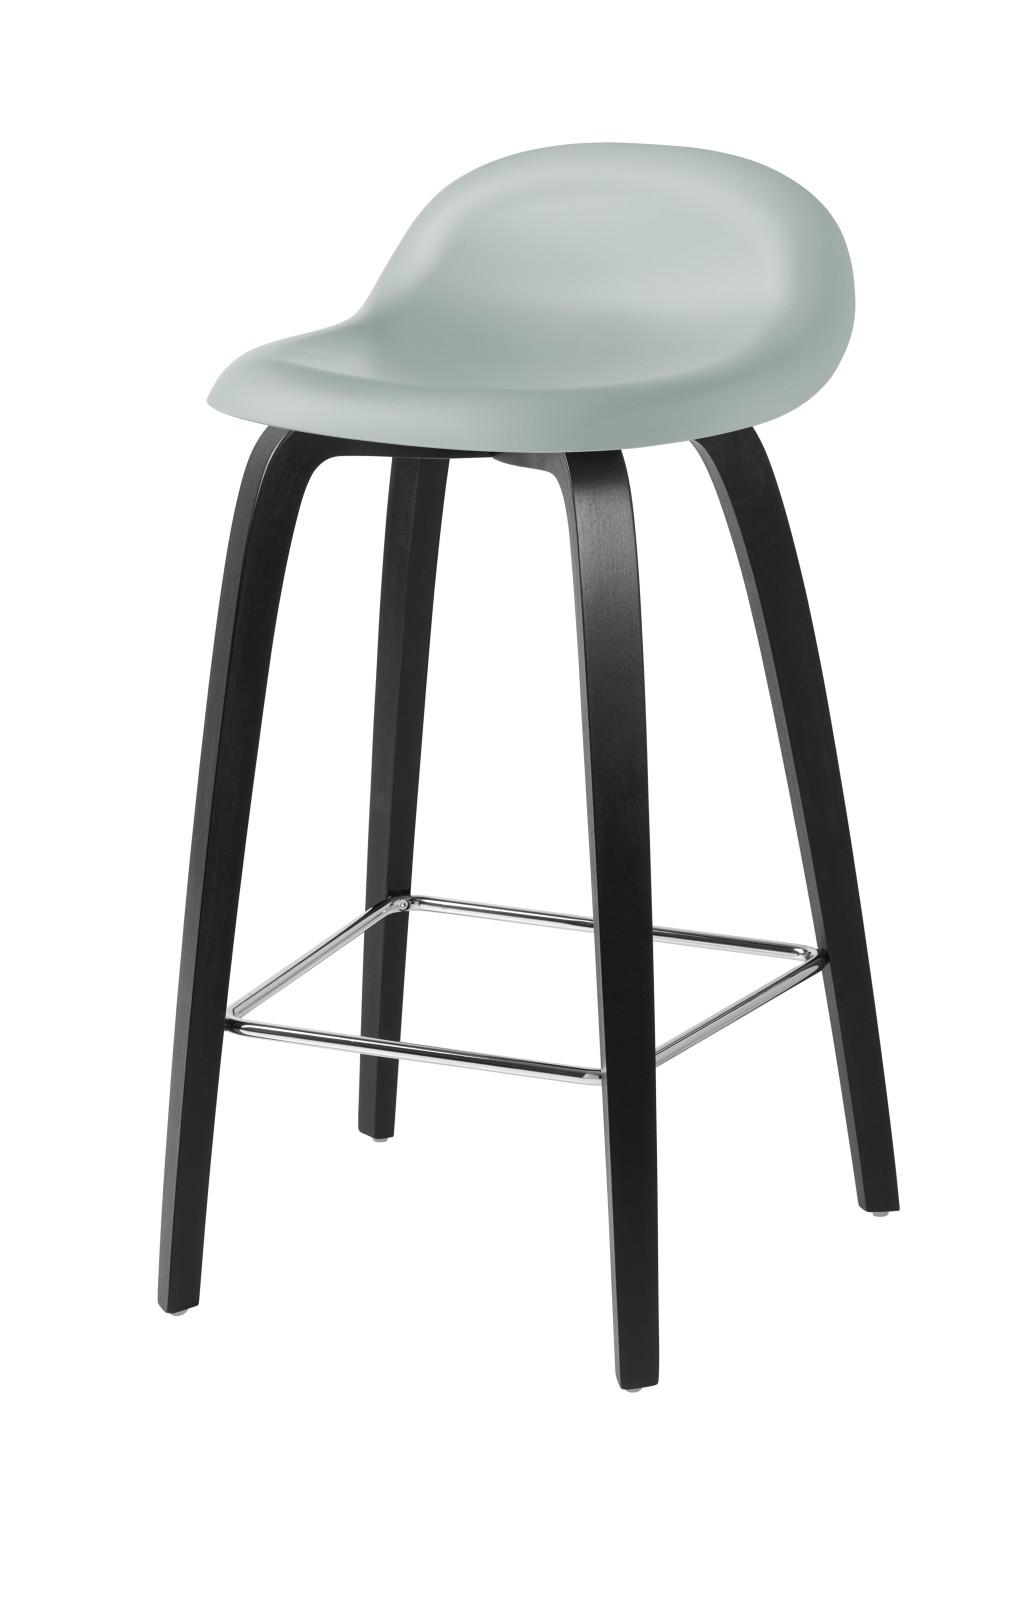 Gubi 3D Wood Base Counter Stool - Unupholstered Gubi HiRek Nightfall Blue, Gubi Wood Black Stained B